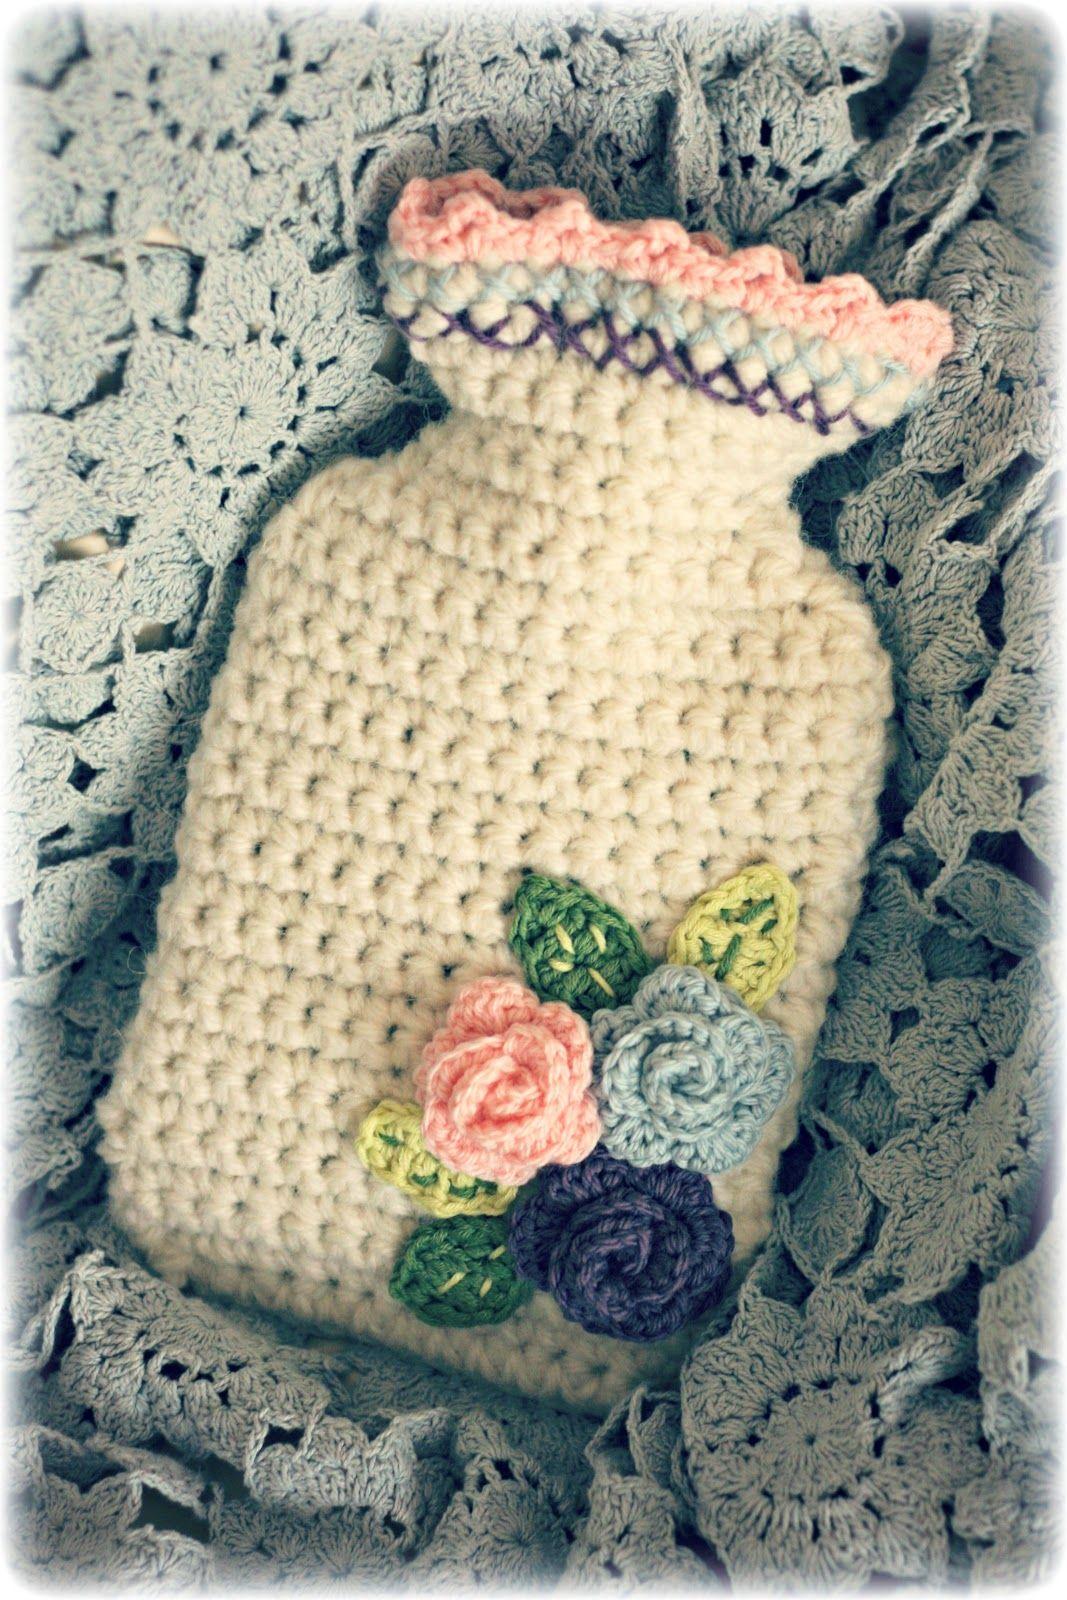 Coco Rose Diaries: Hot Water Bottle Cover Tutorial | Crochet Fun ...